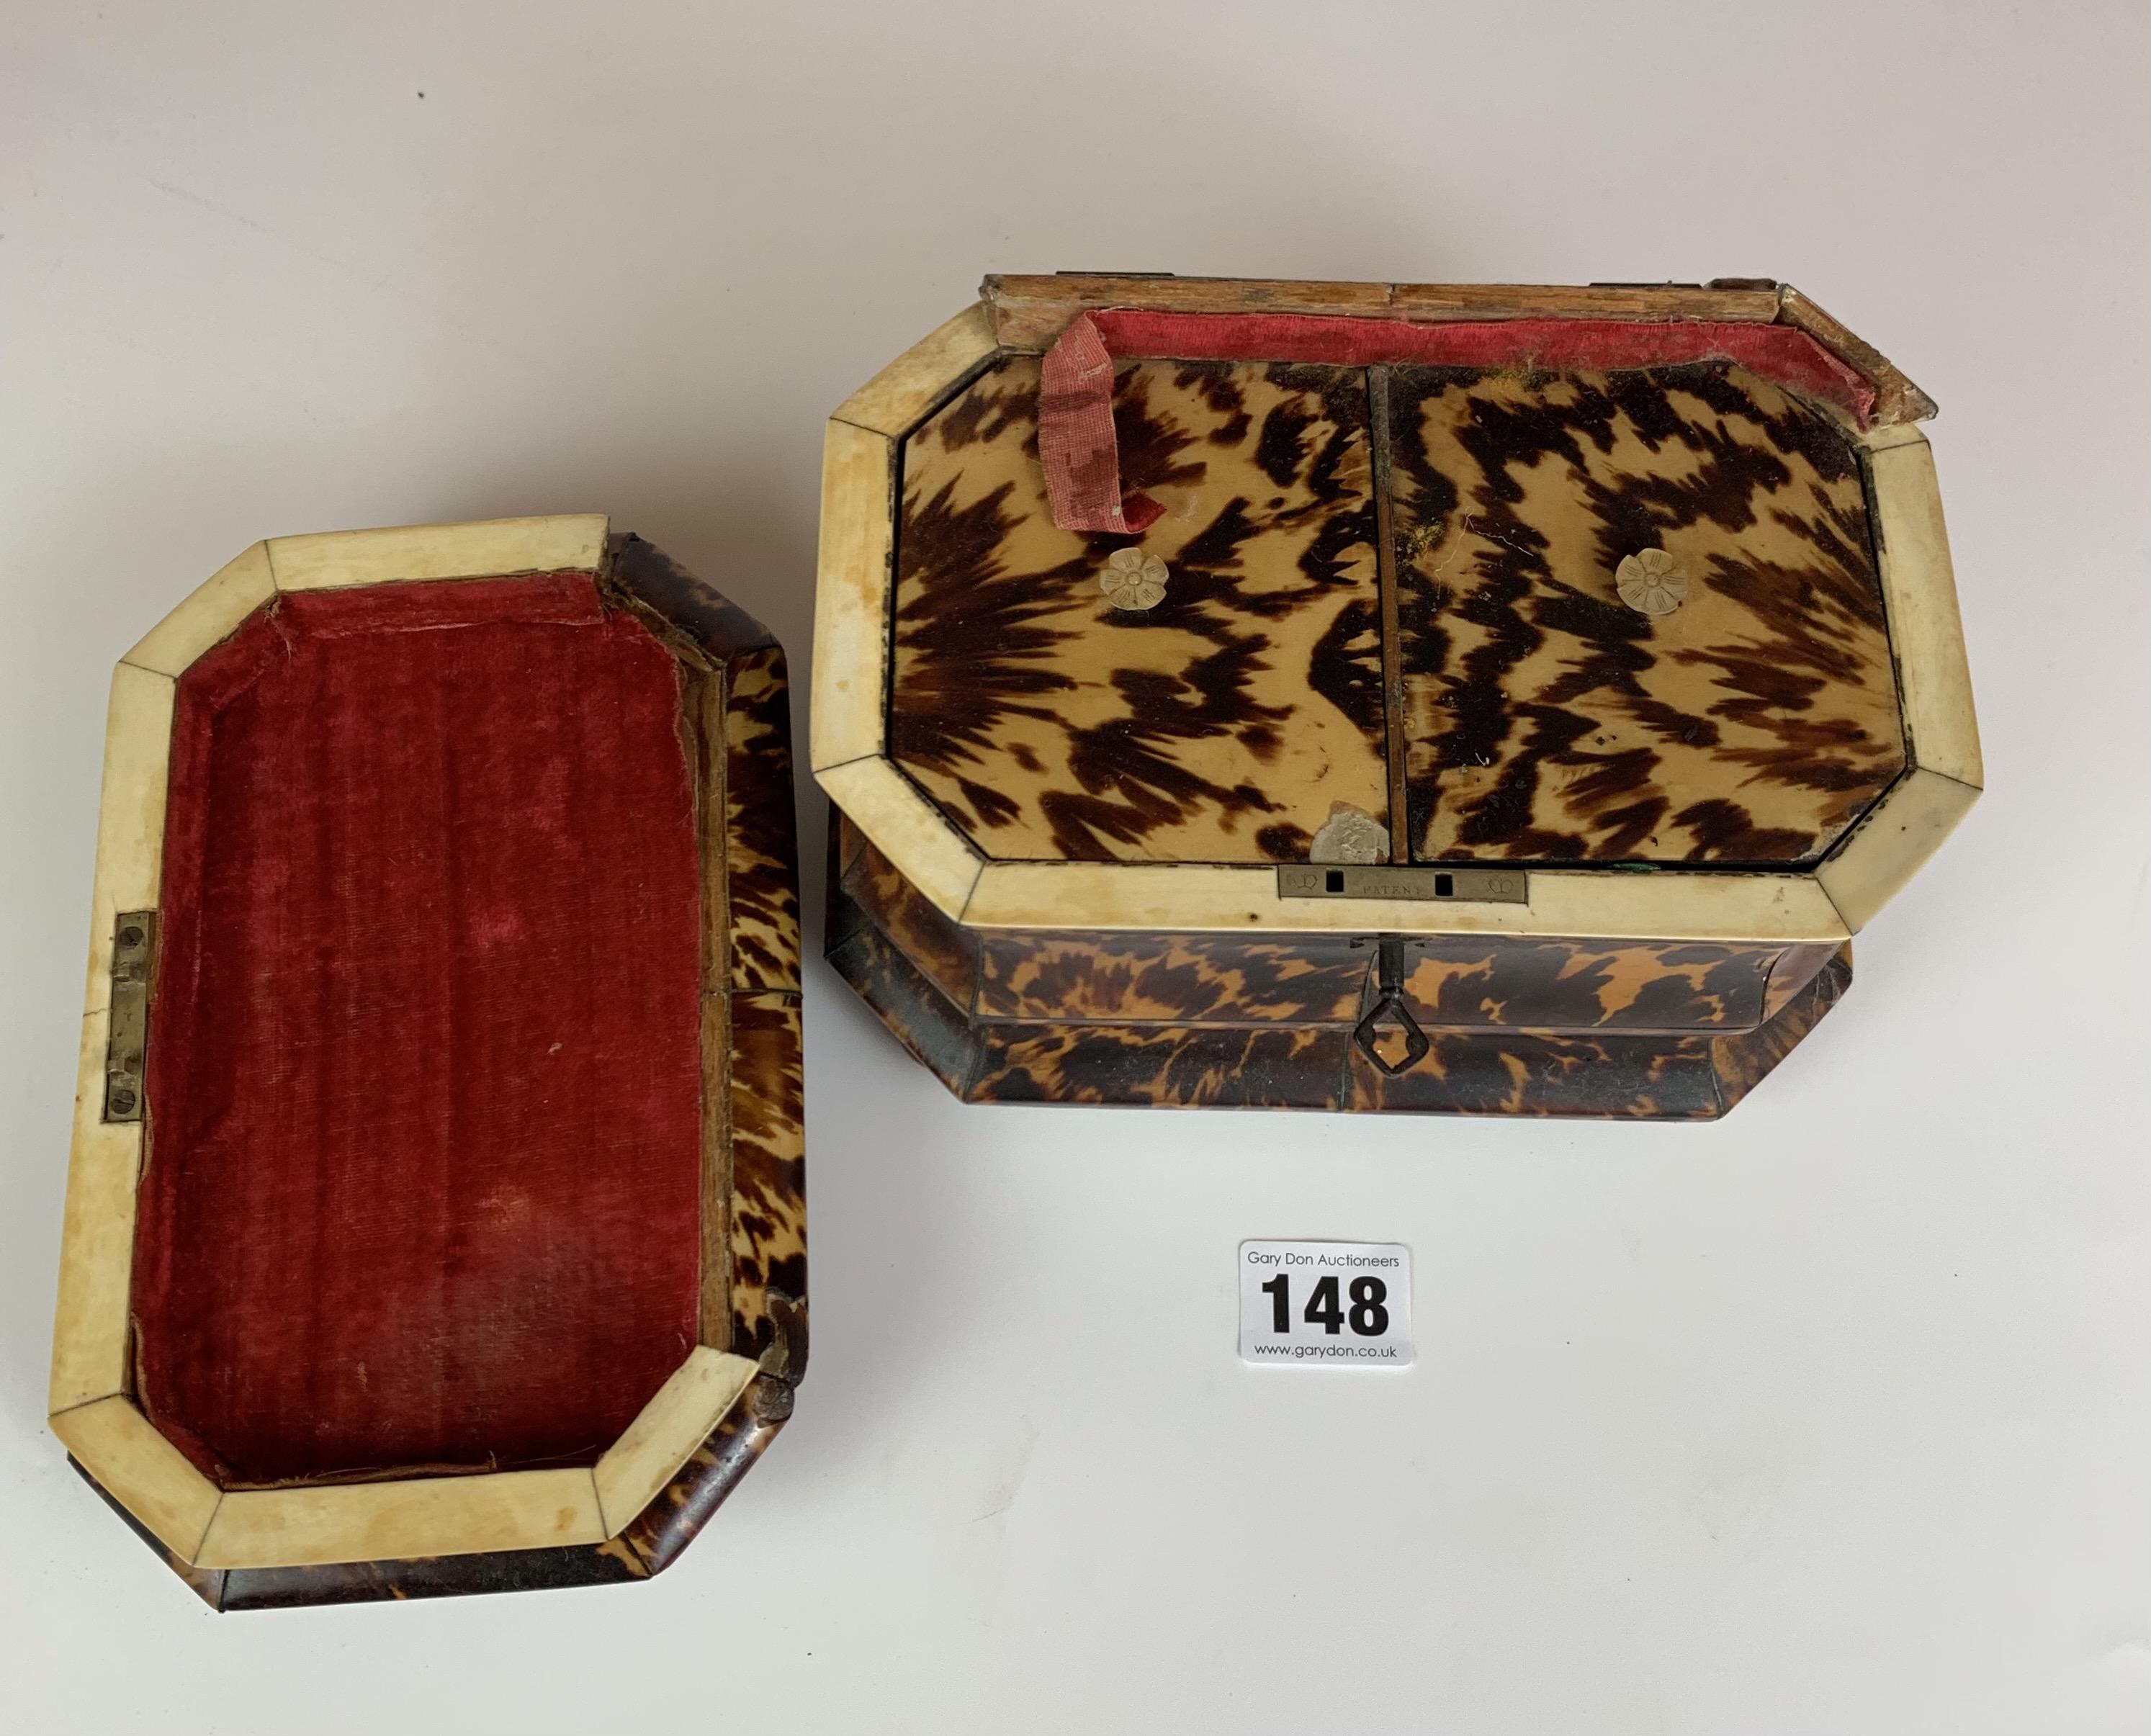 "Regency Tortoiseshell veneered tea caddy with twin compartment, c. 1820. Lid damaged. 7.5"" long x 5"" - Image 4 of 5"